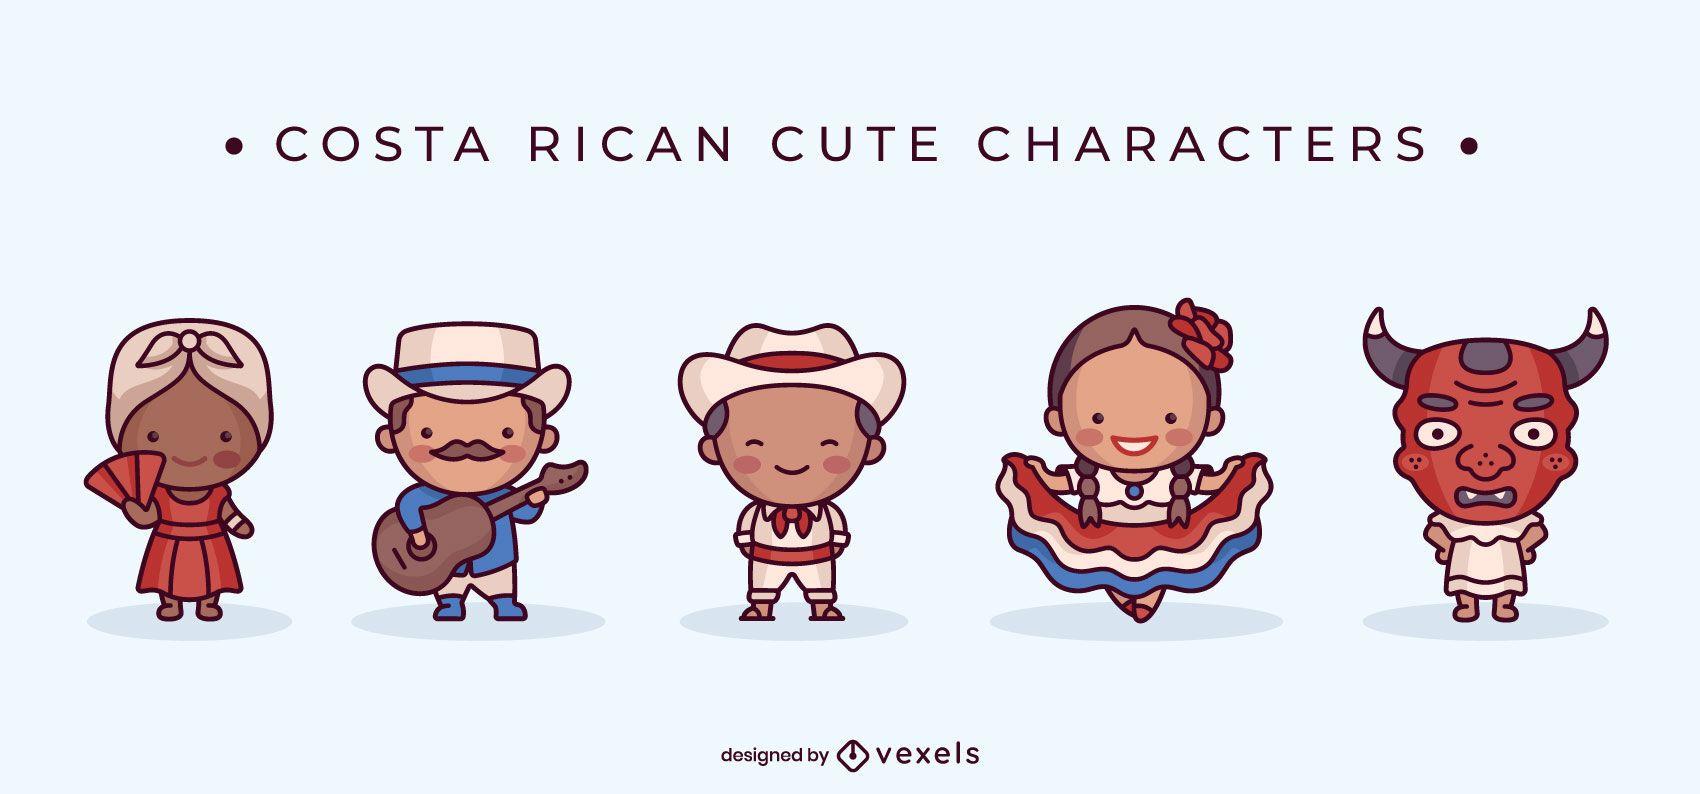 Costa rican cute character set